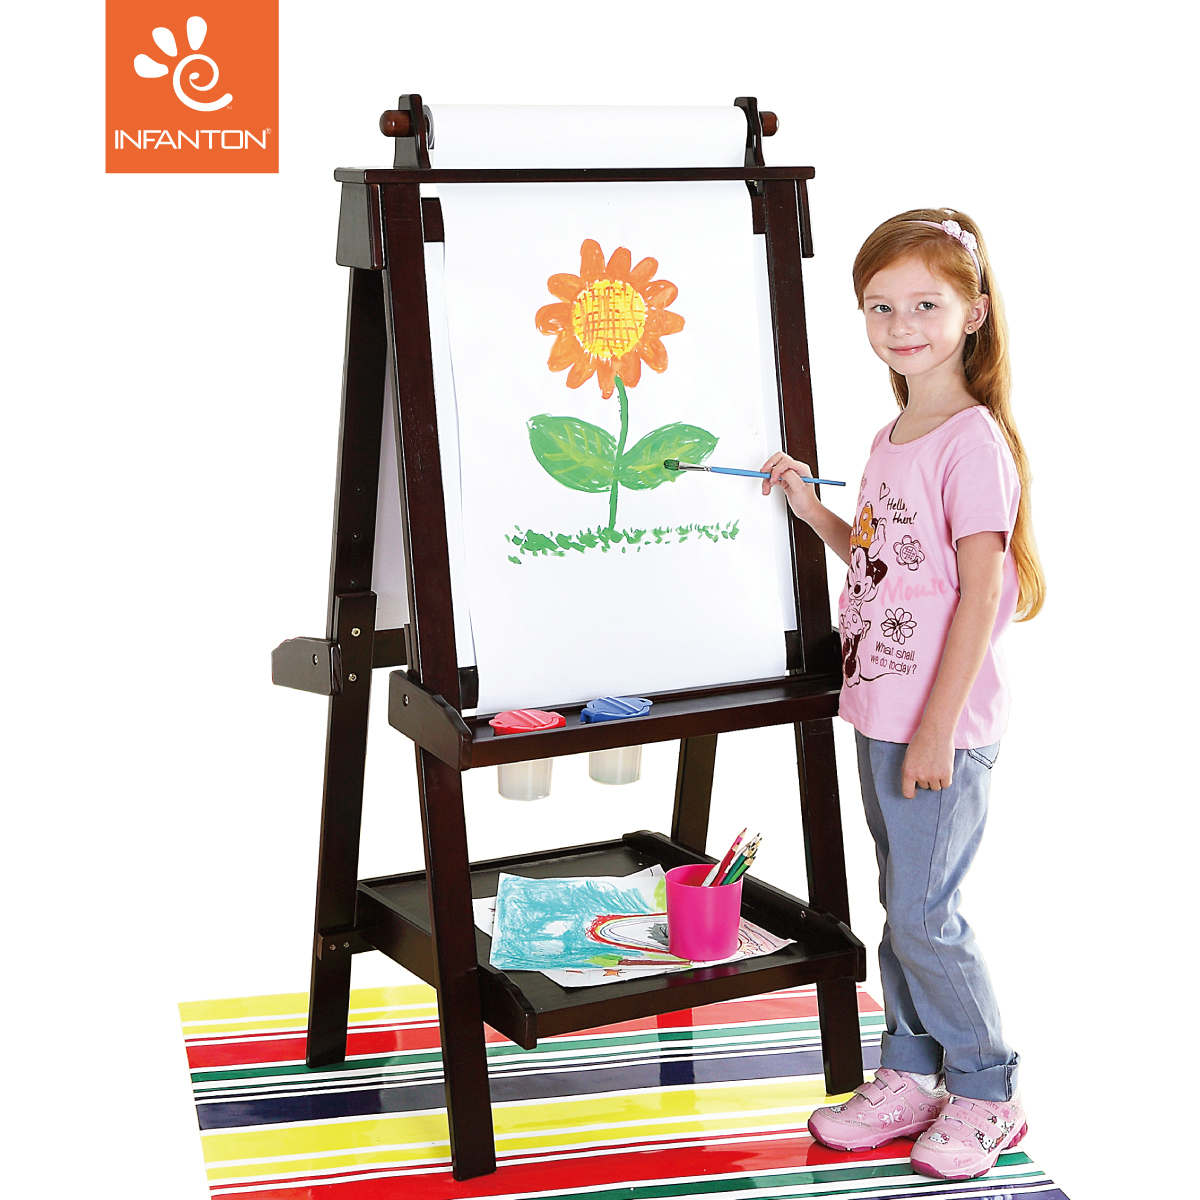 Infanton正品双面磁性可升降实木儿童画板画架支架式黑板写字板